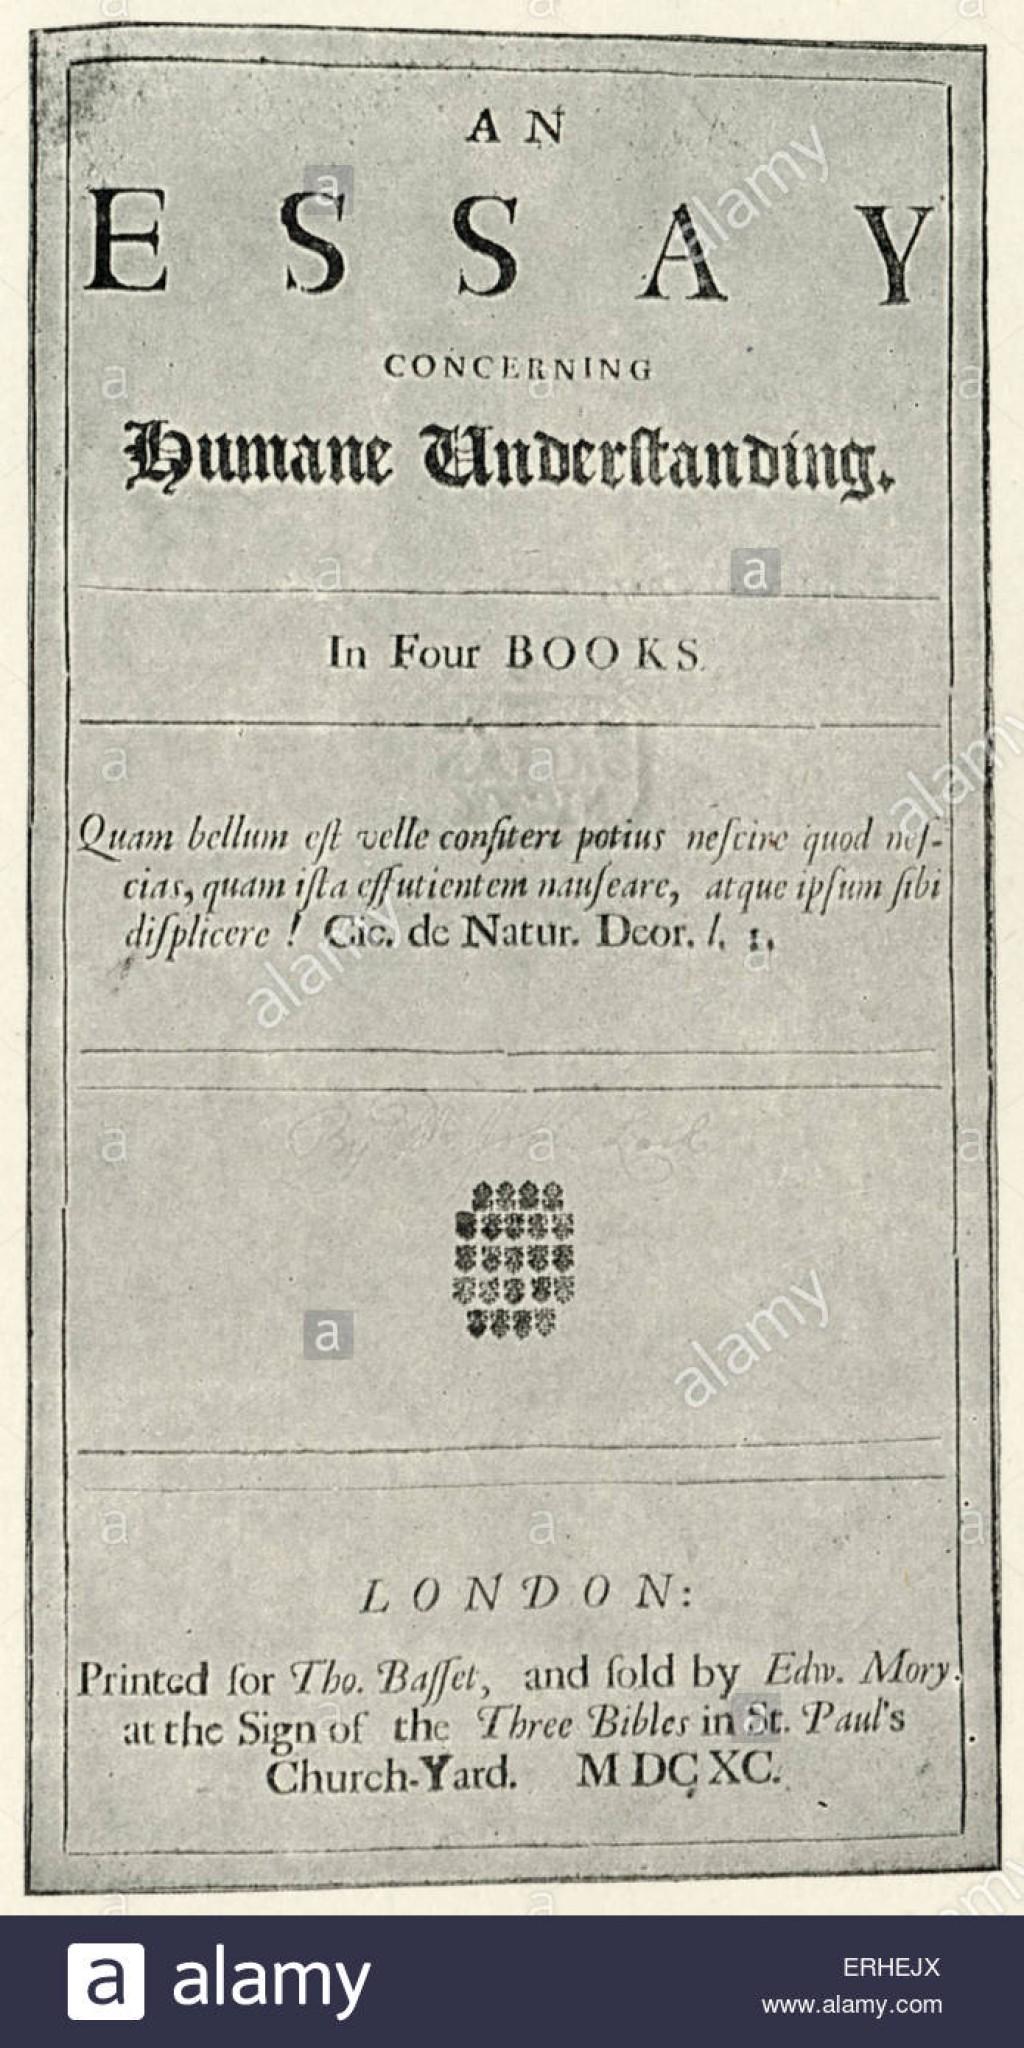 009 Essay Example John Locke Titlepage To His On Humane Understanding English Impressive Concerning Human Book 4 Pdf Summary Large